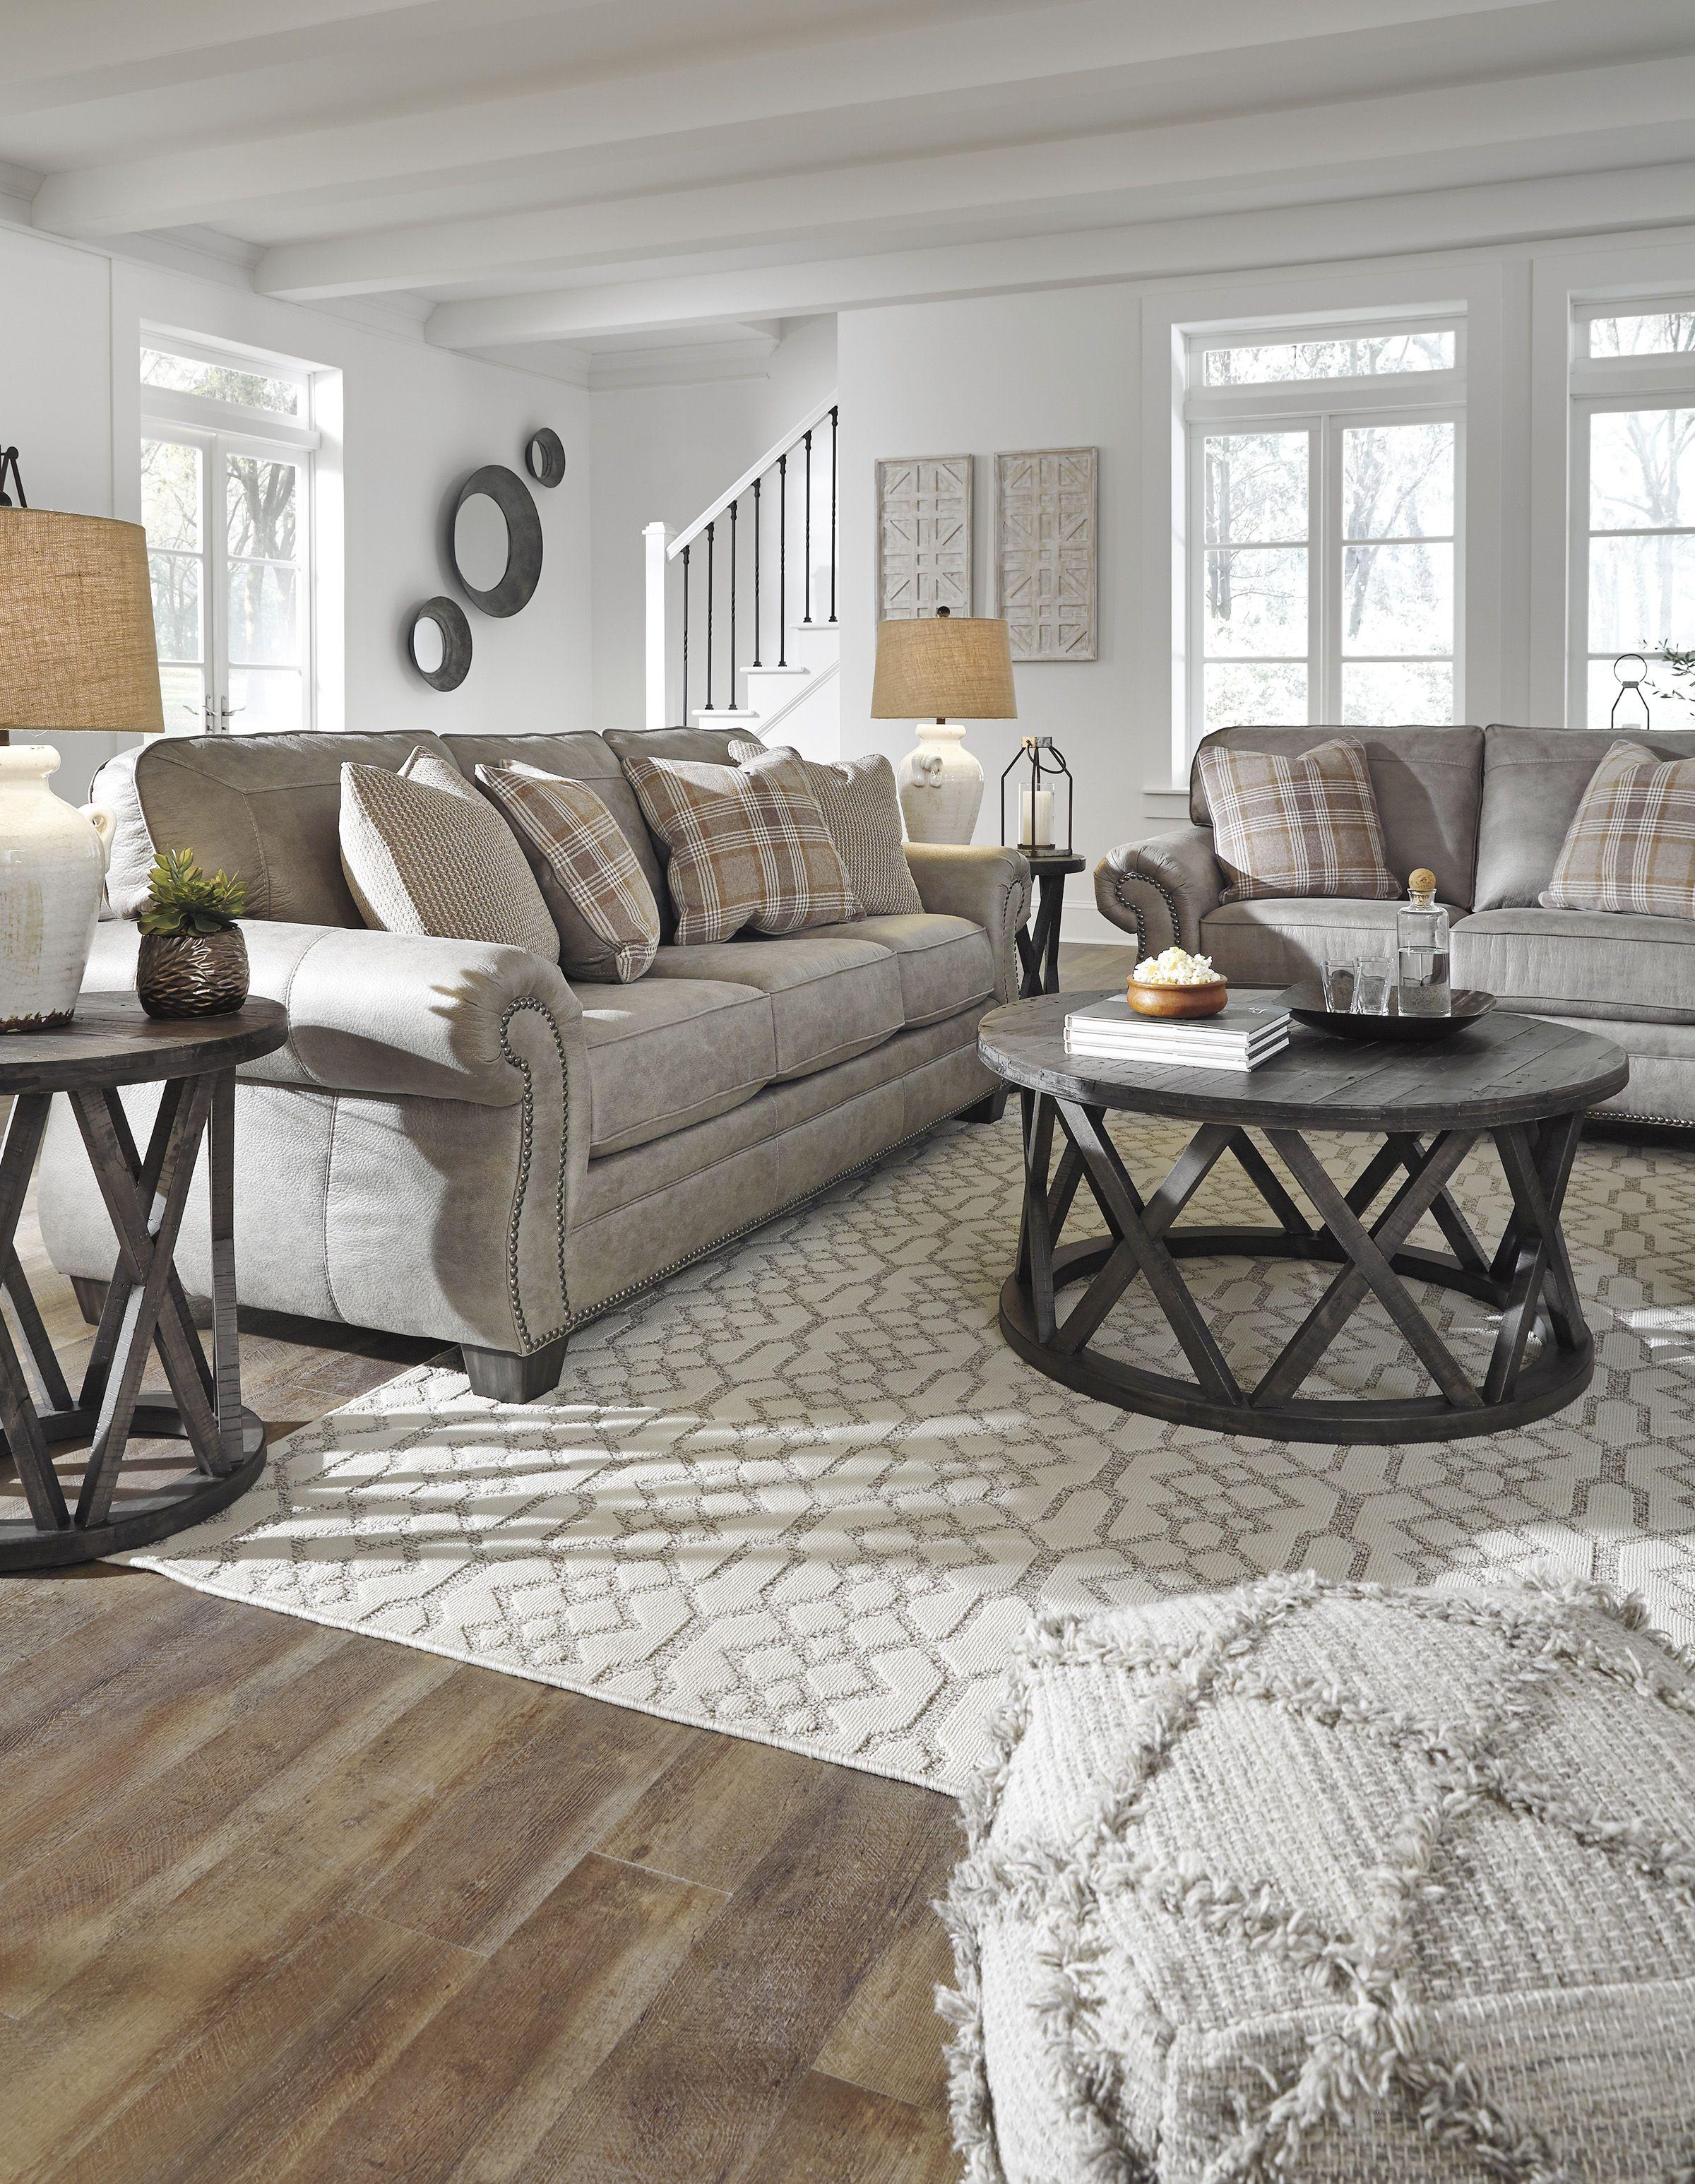 Olsberg Sofa Interior Design Living Room Classic Furniture Design Interior Design #olsberg #steel #living #room #set